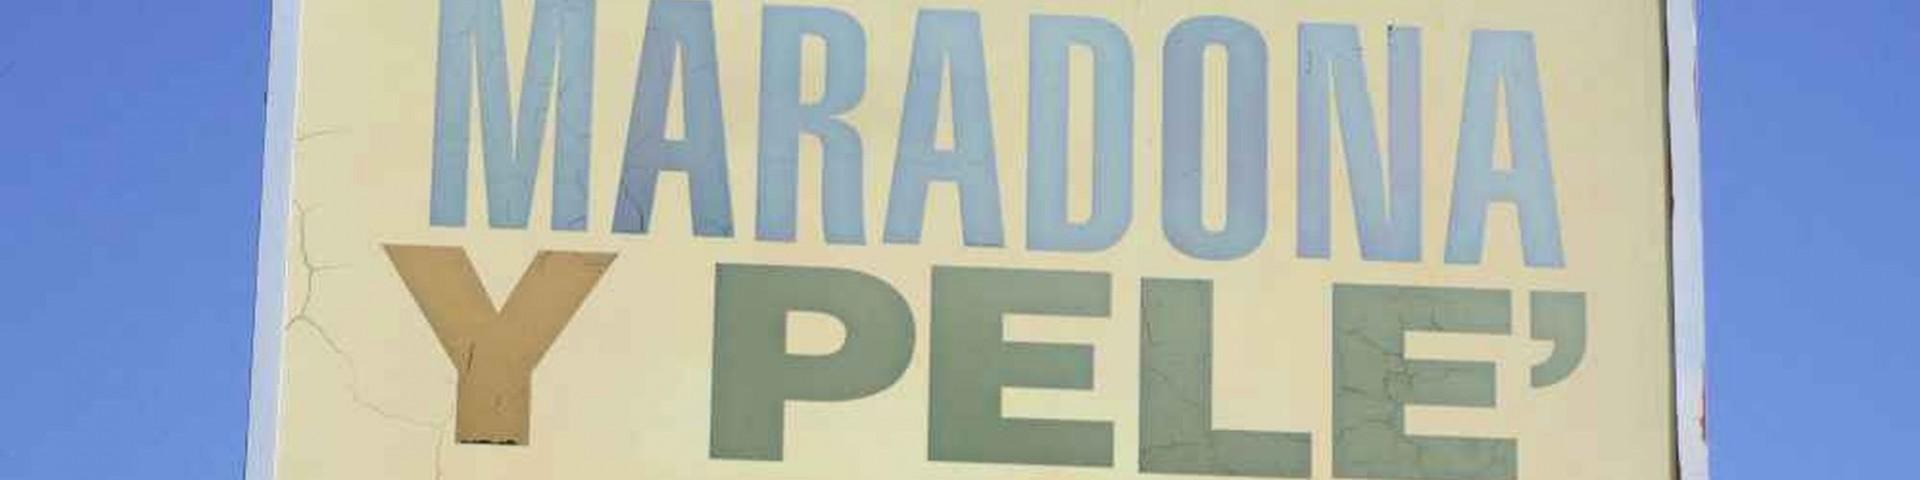 Thegiornalisti, Maradona Y Pelé